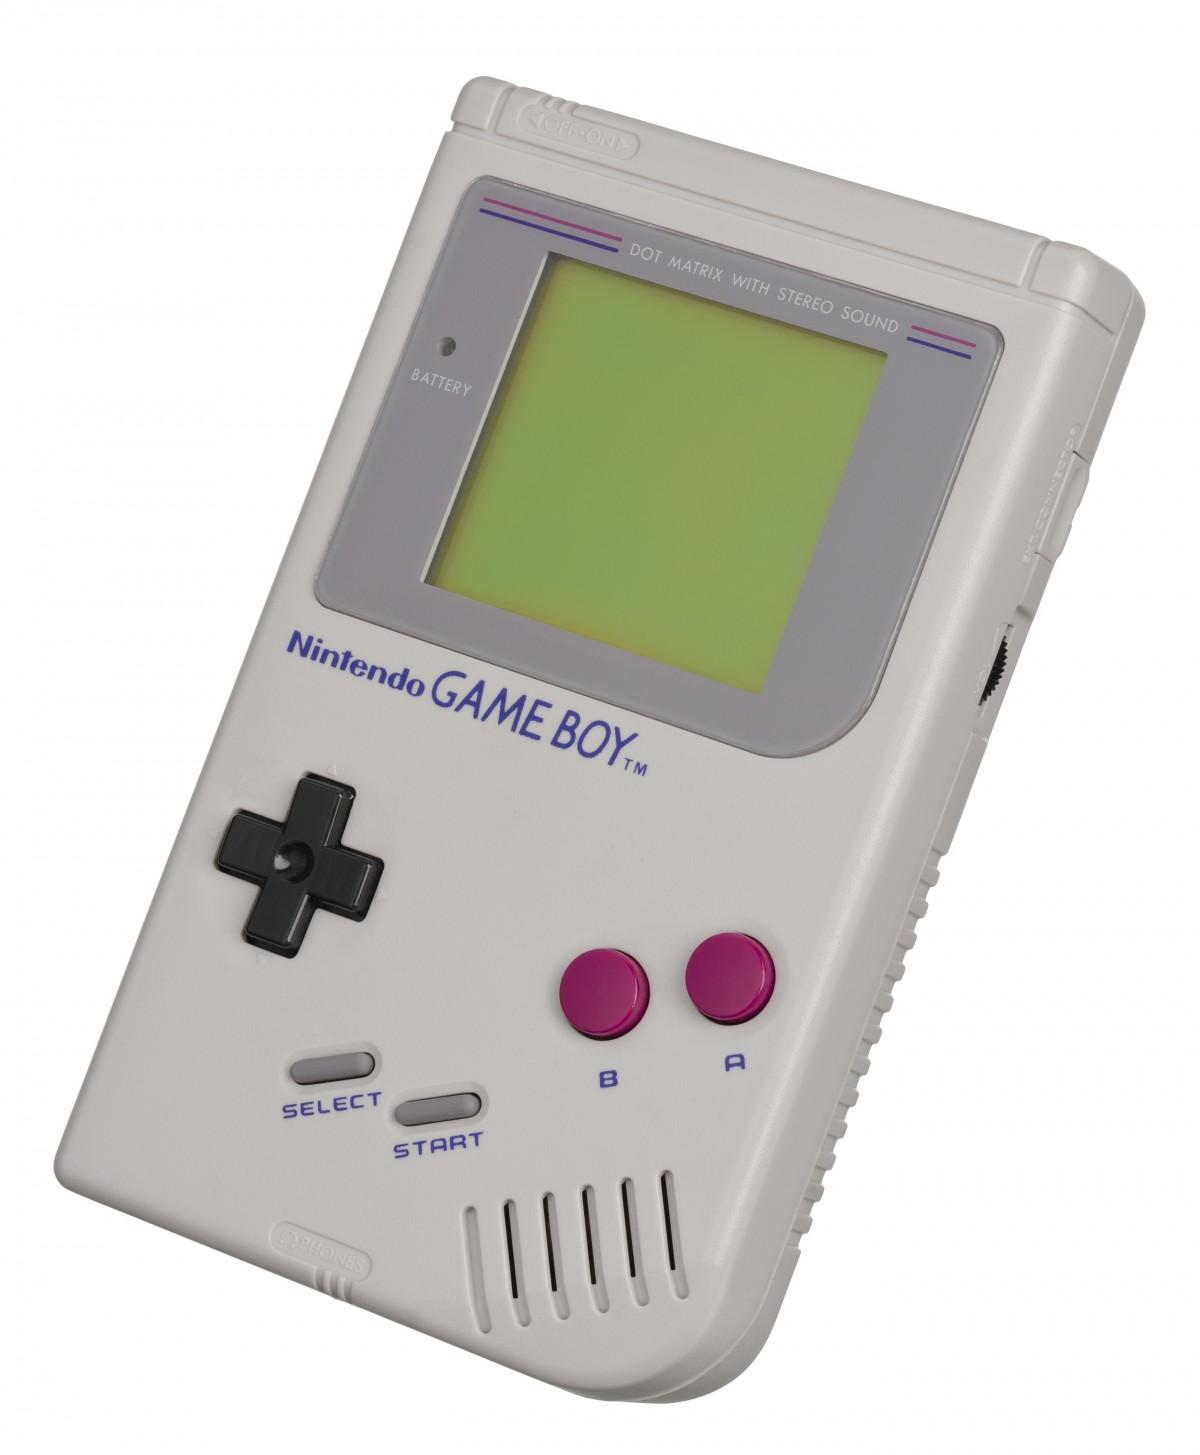 Free Images : technology, play, retro, gadget, nostalgia ...